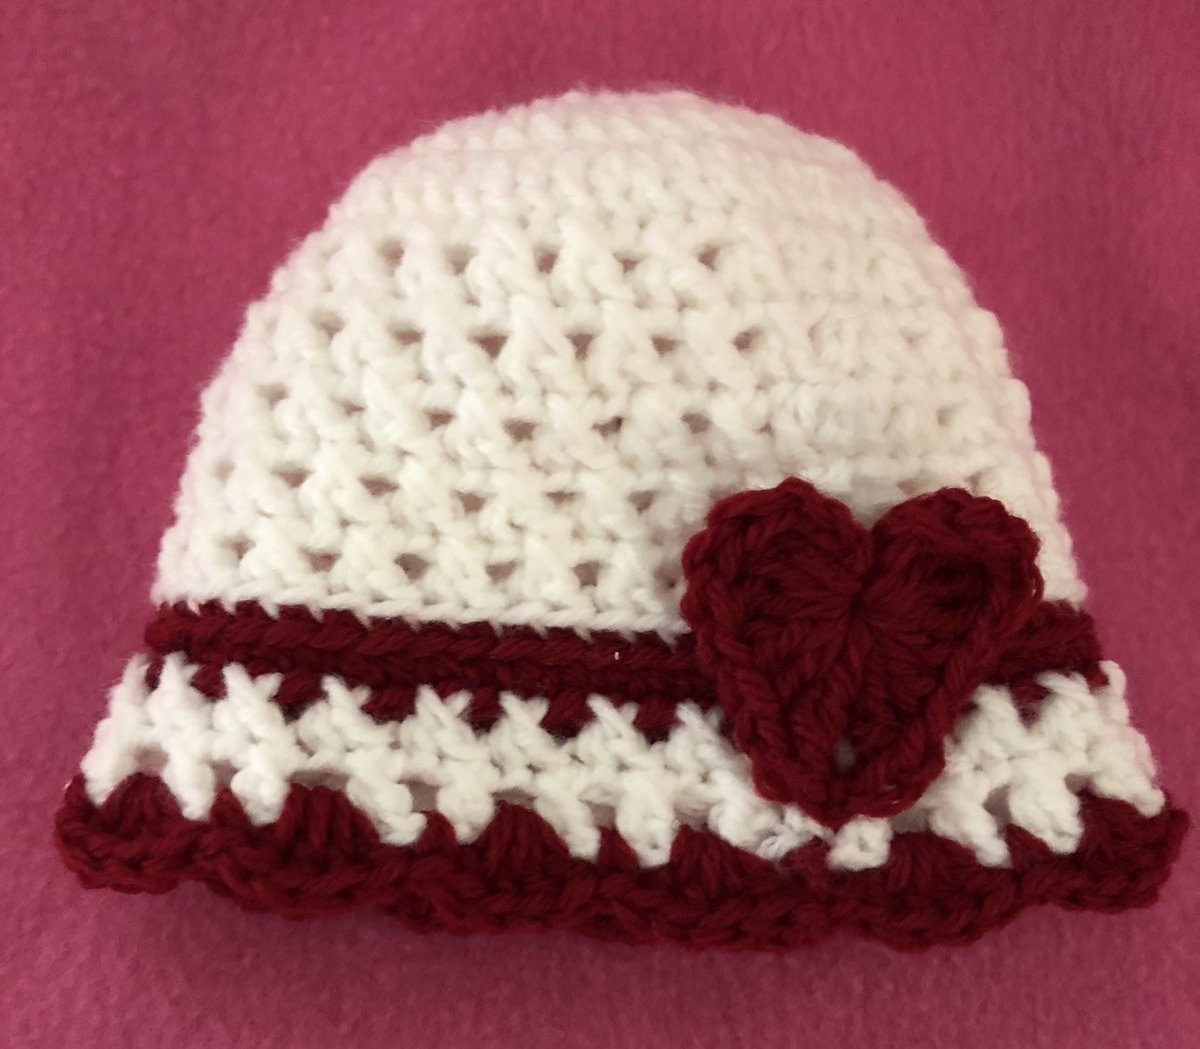 5459b156369 ... the latest addition to my  etsy shop  Valentine s Day Crocheted Baby  Caps https   etsy.me 2RtNgk0  accessories  hat  babyshower  valentinesday   newborns ...